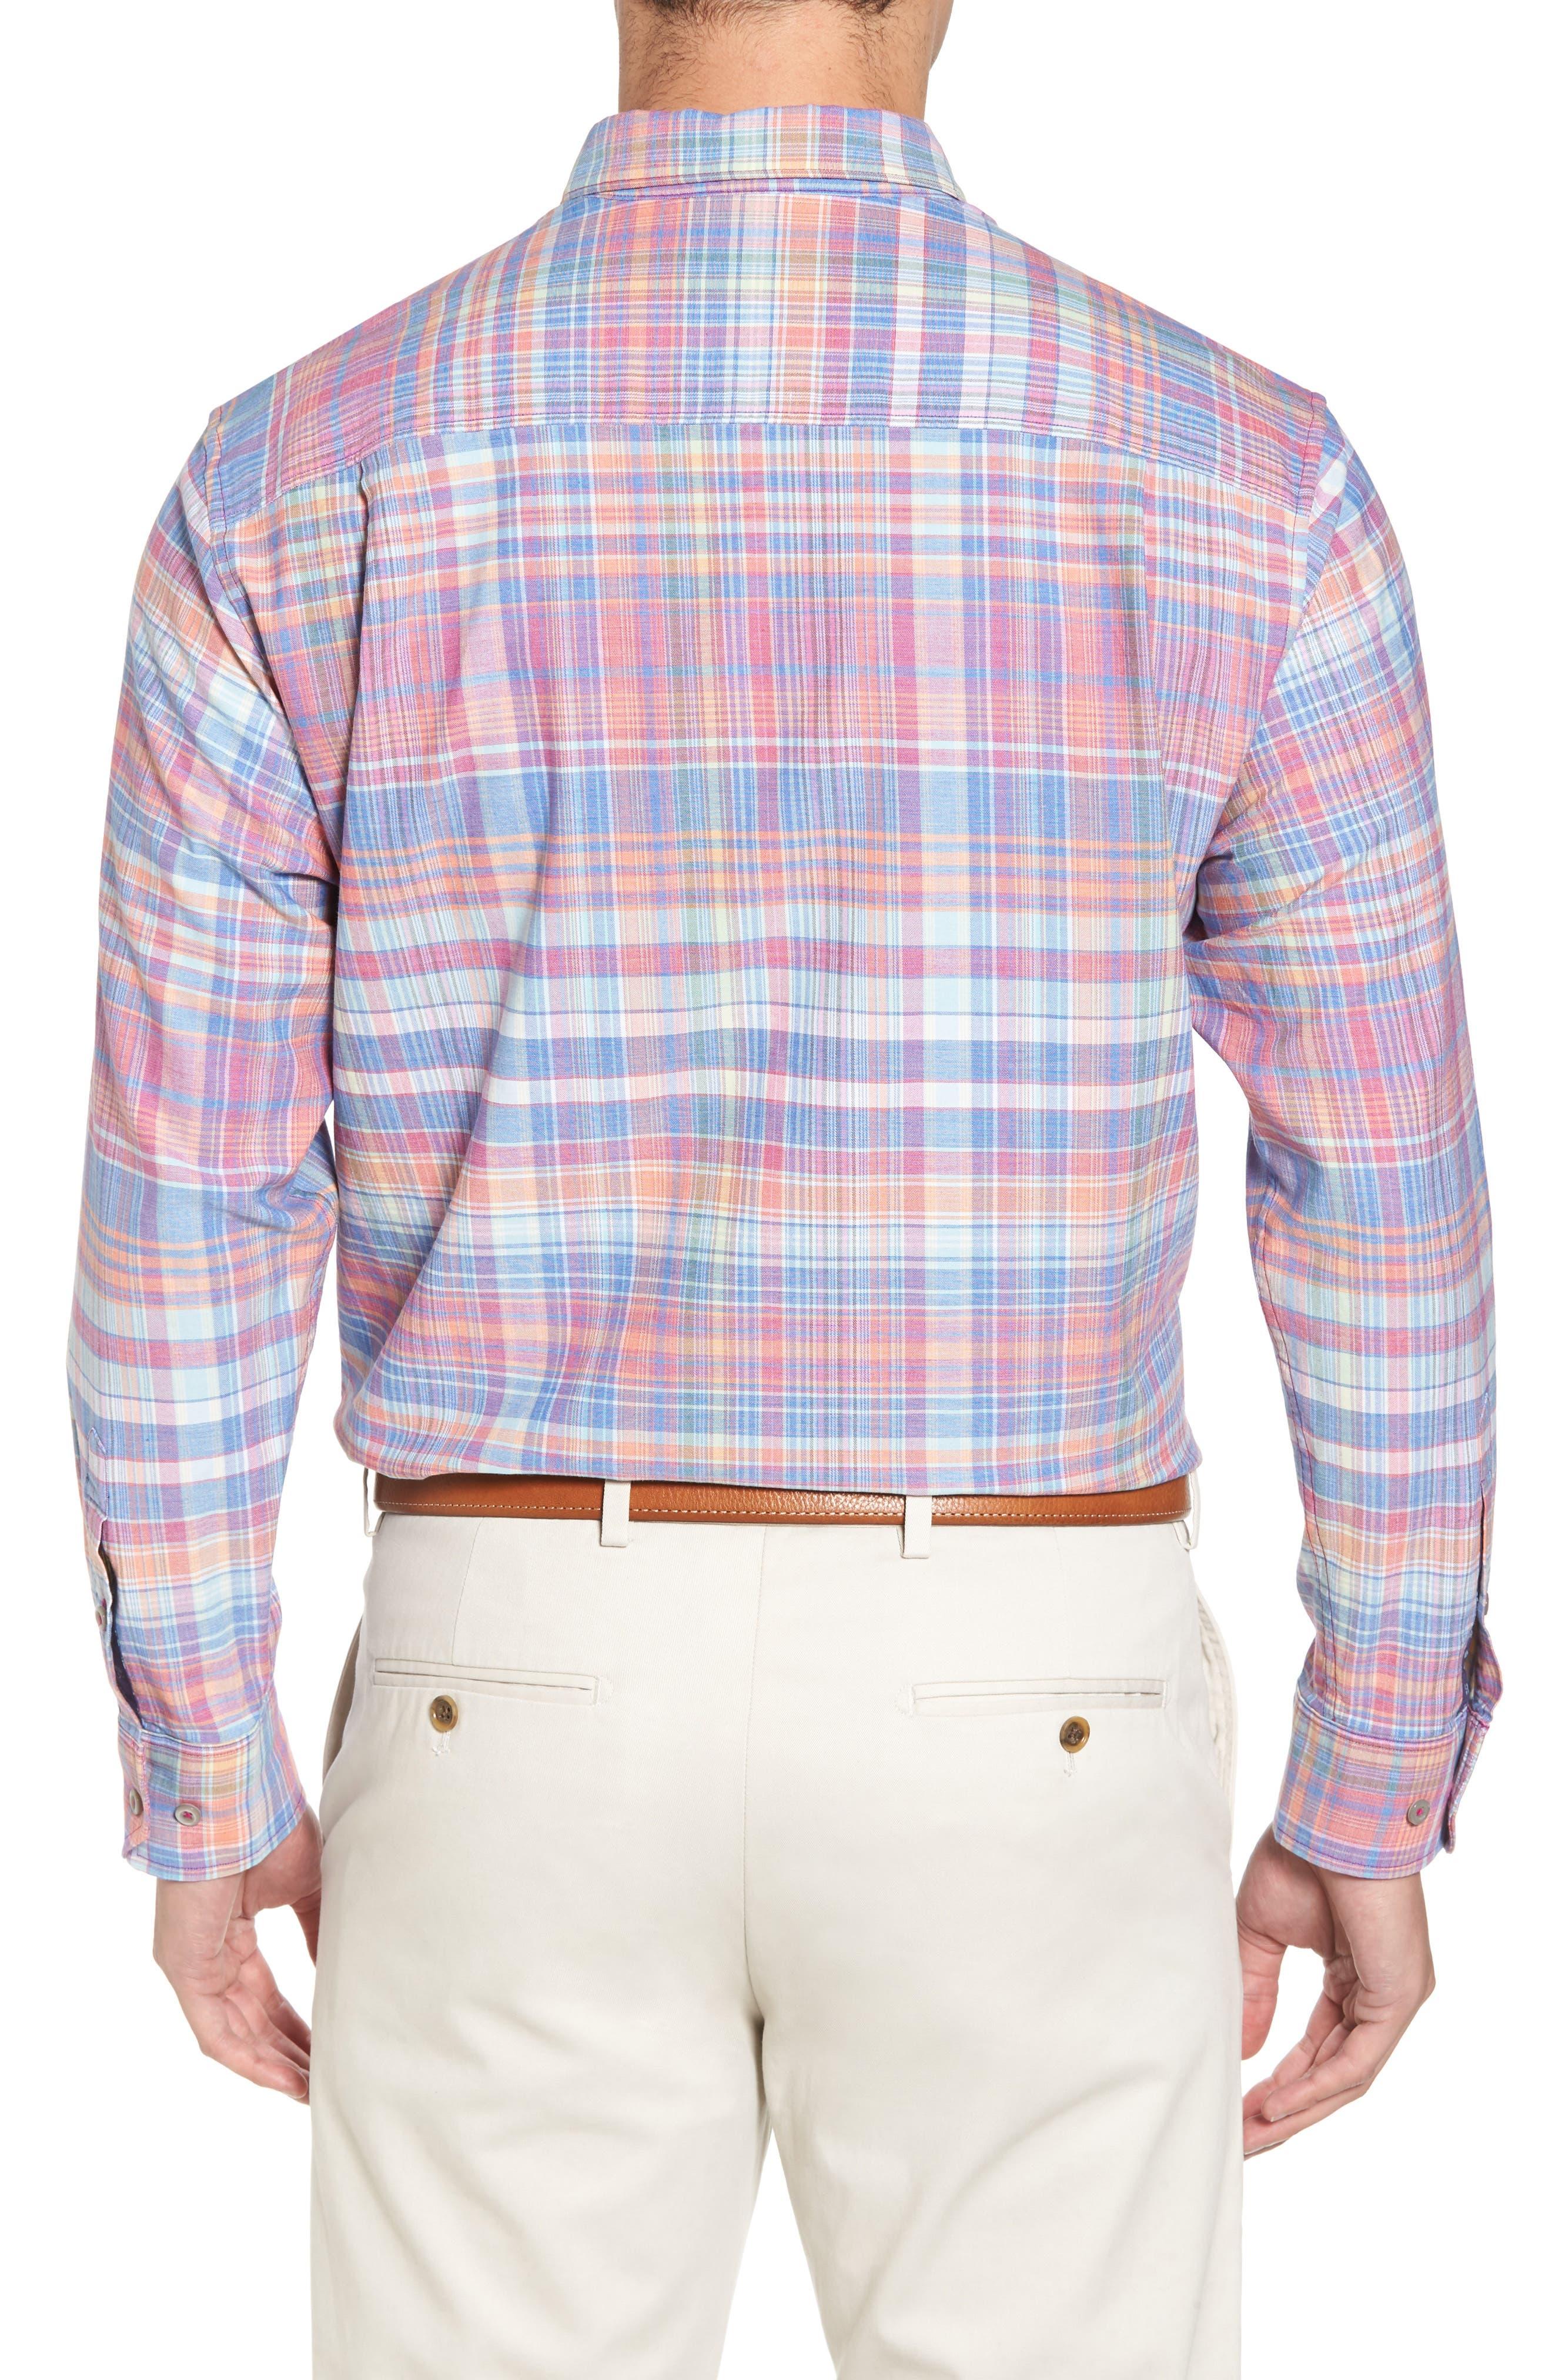 Mangrove Madras Regular Fit Sport Shirt,                             Alternate thumbnail 2, color,                             650